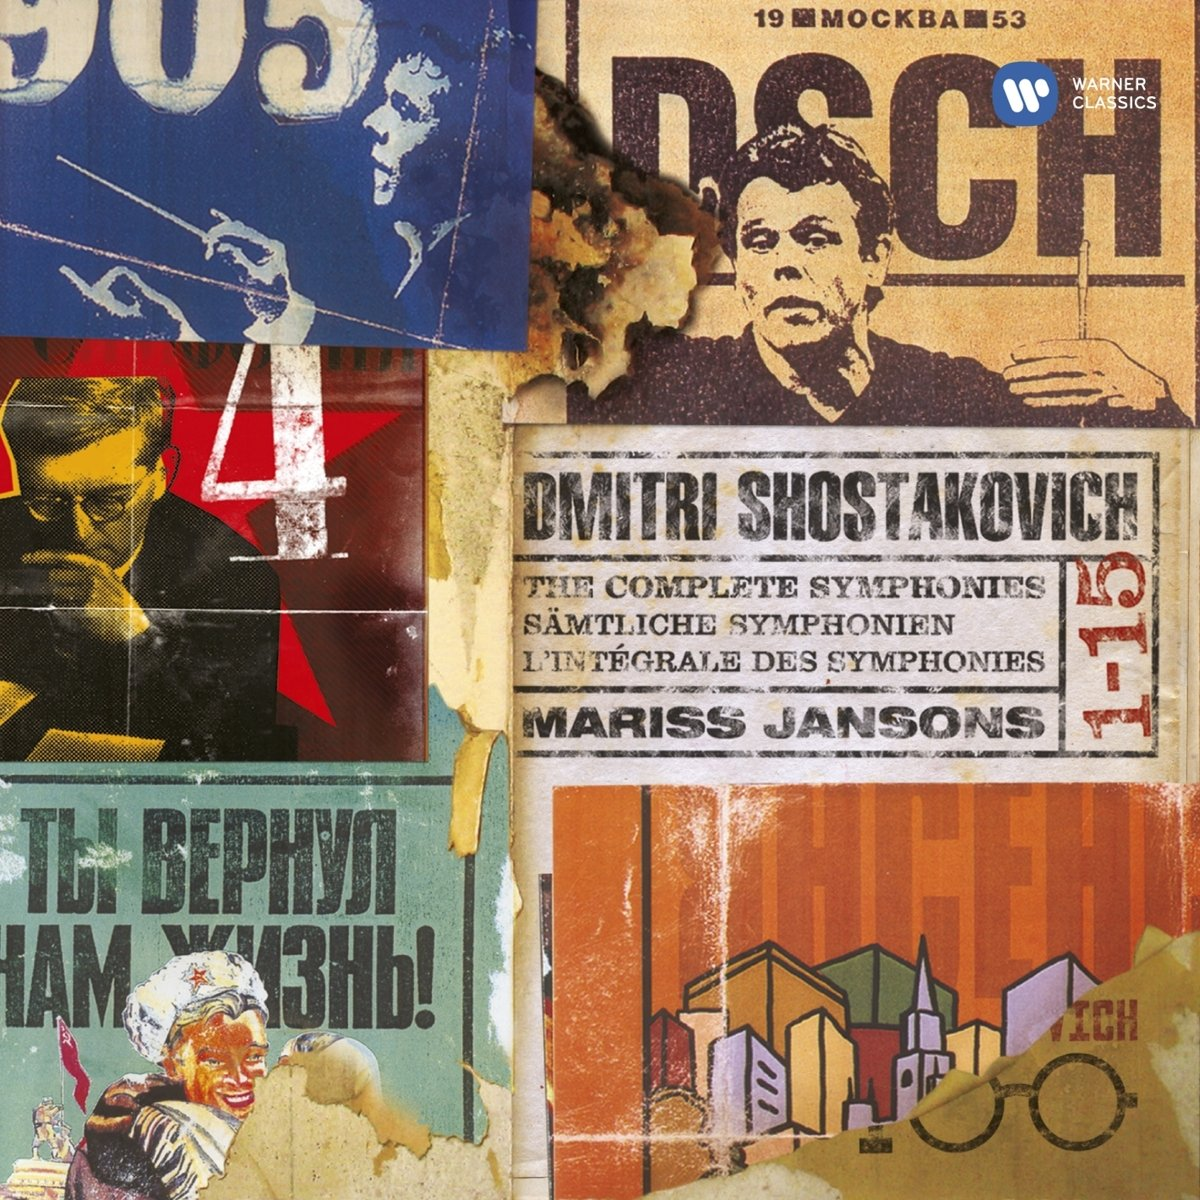 Shostakovich: The Complete Symphonies - Mariss Jansons (10 CD)